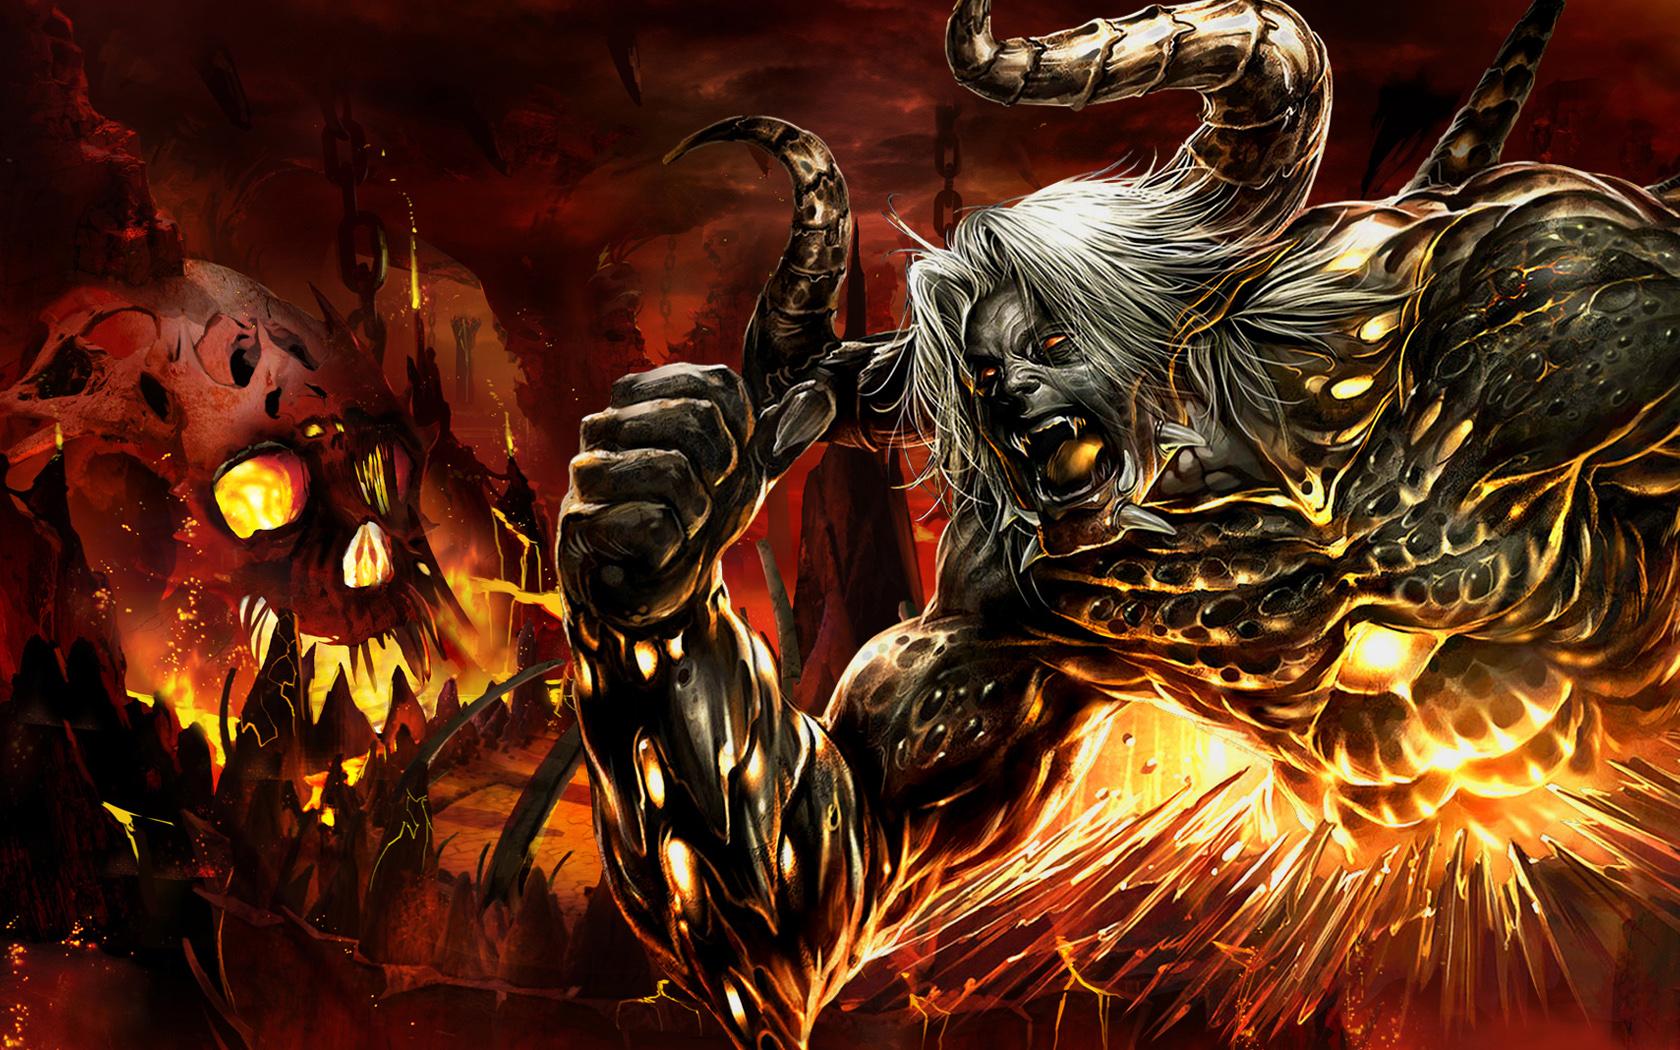 Cool Bull Devil Wallpaper Android 2764 Wallpaper High 1680x1050